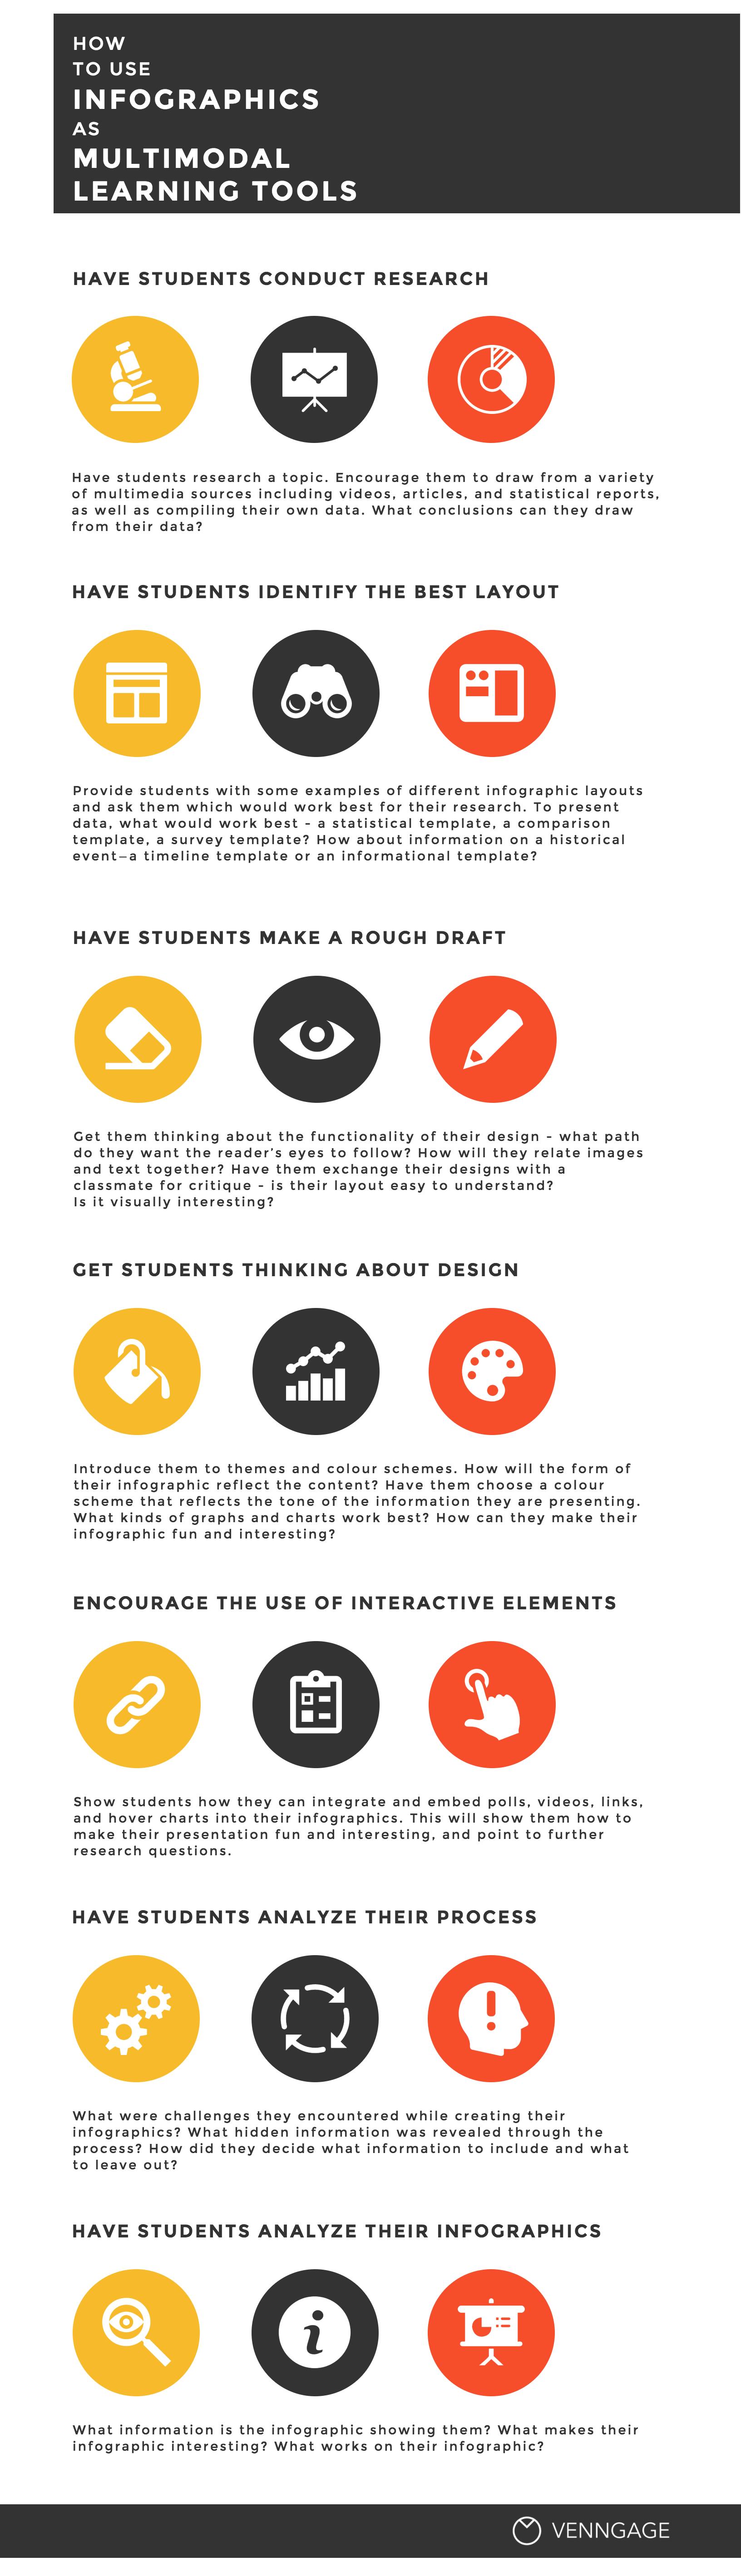 tools of critical thinking flipkart